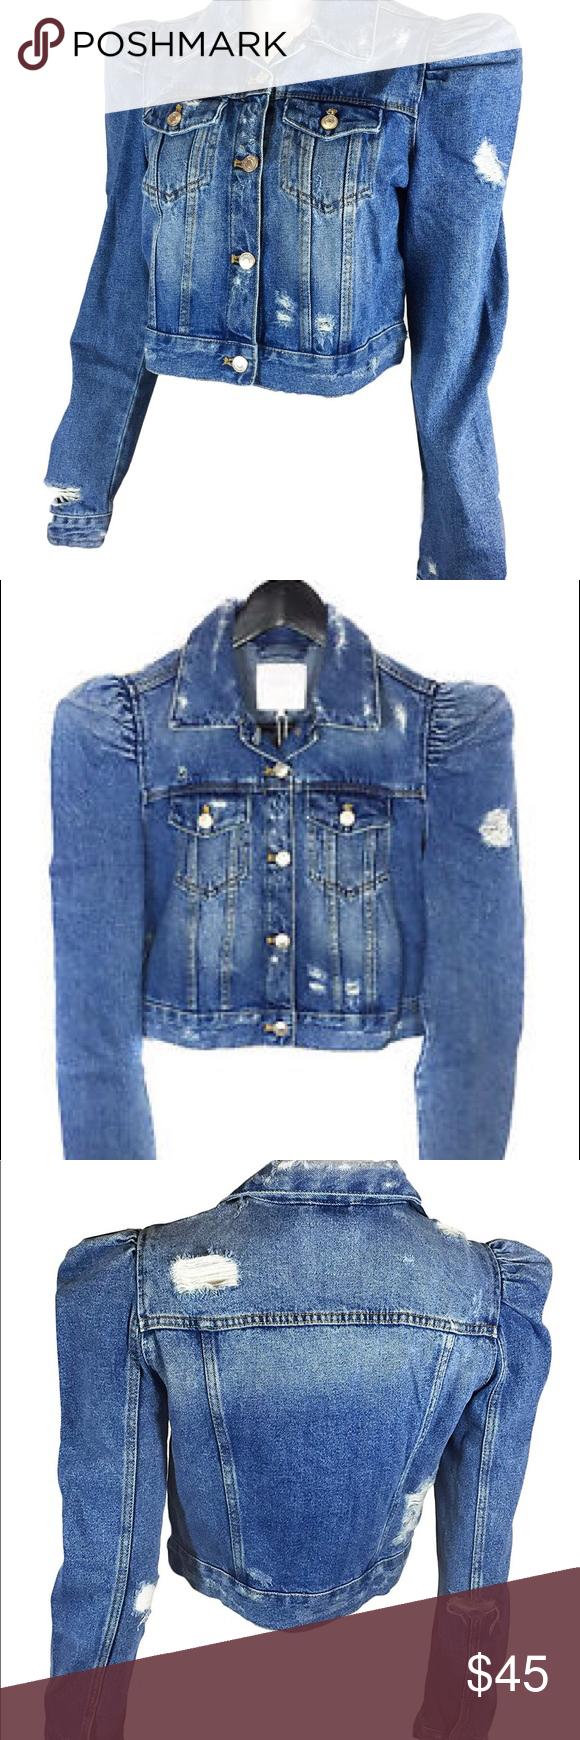 003fc180803 Zara Women's Denim Jacket With Puff Sleeves Zara trf denim ...